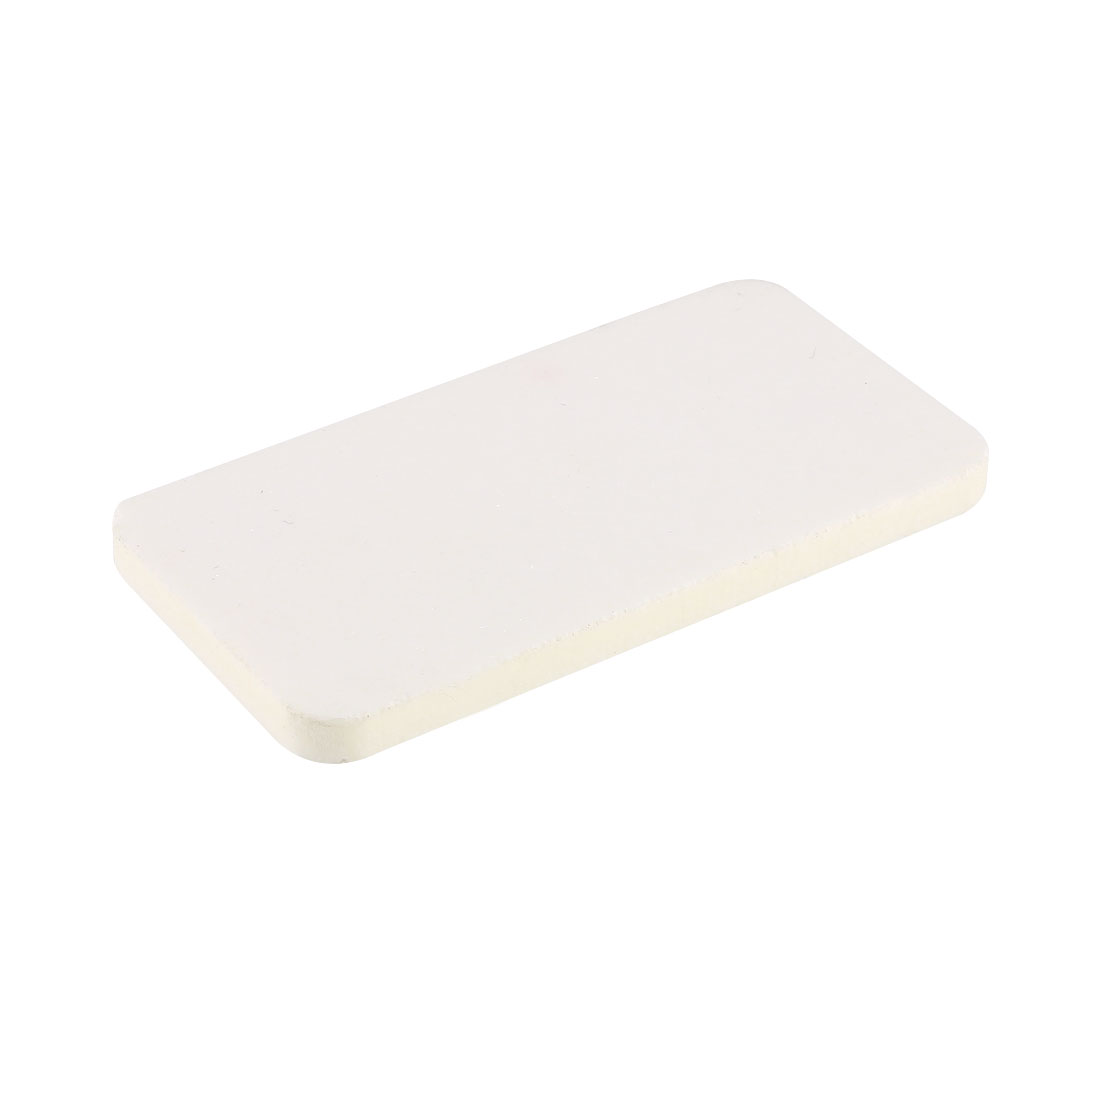 Soldering Board Ceramic Insulation Board 2.5 x 1.2 x 0.15inch/61 x 31 x 4.2mm